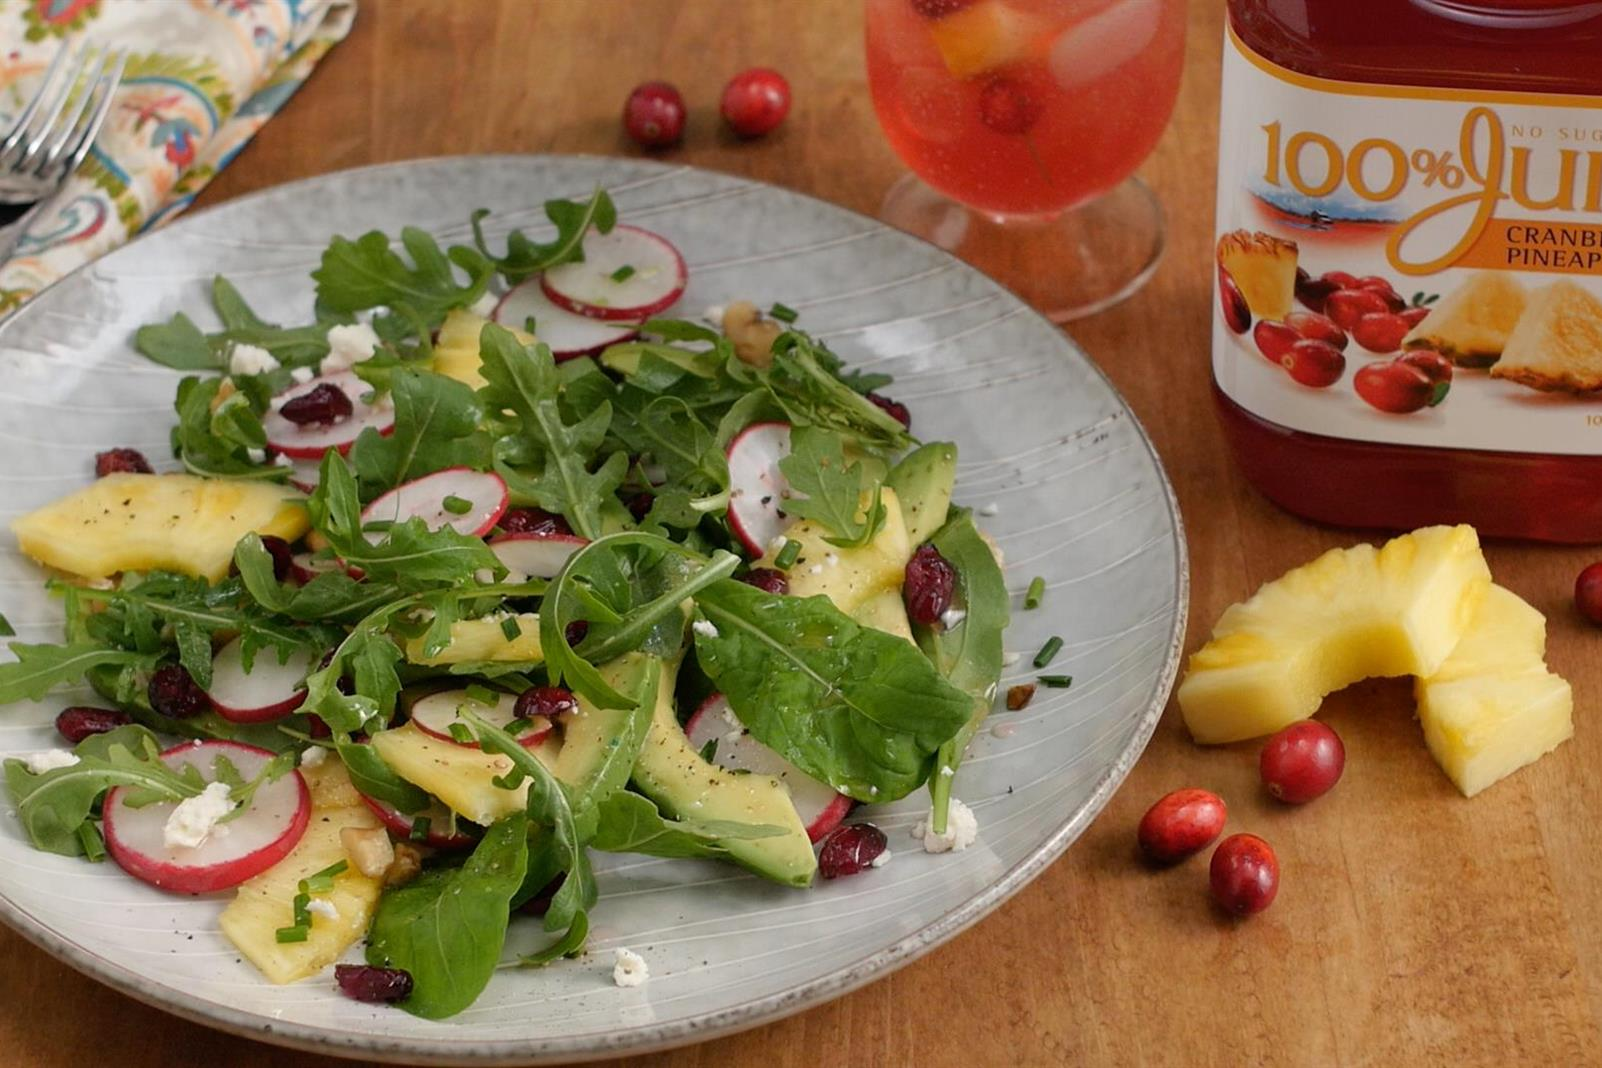 Cranberry Pineapple & Radish Salad